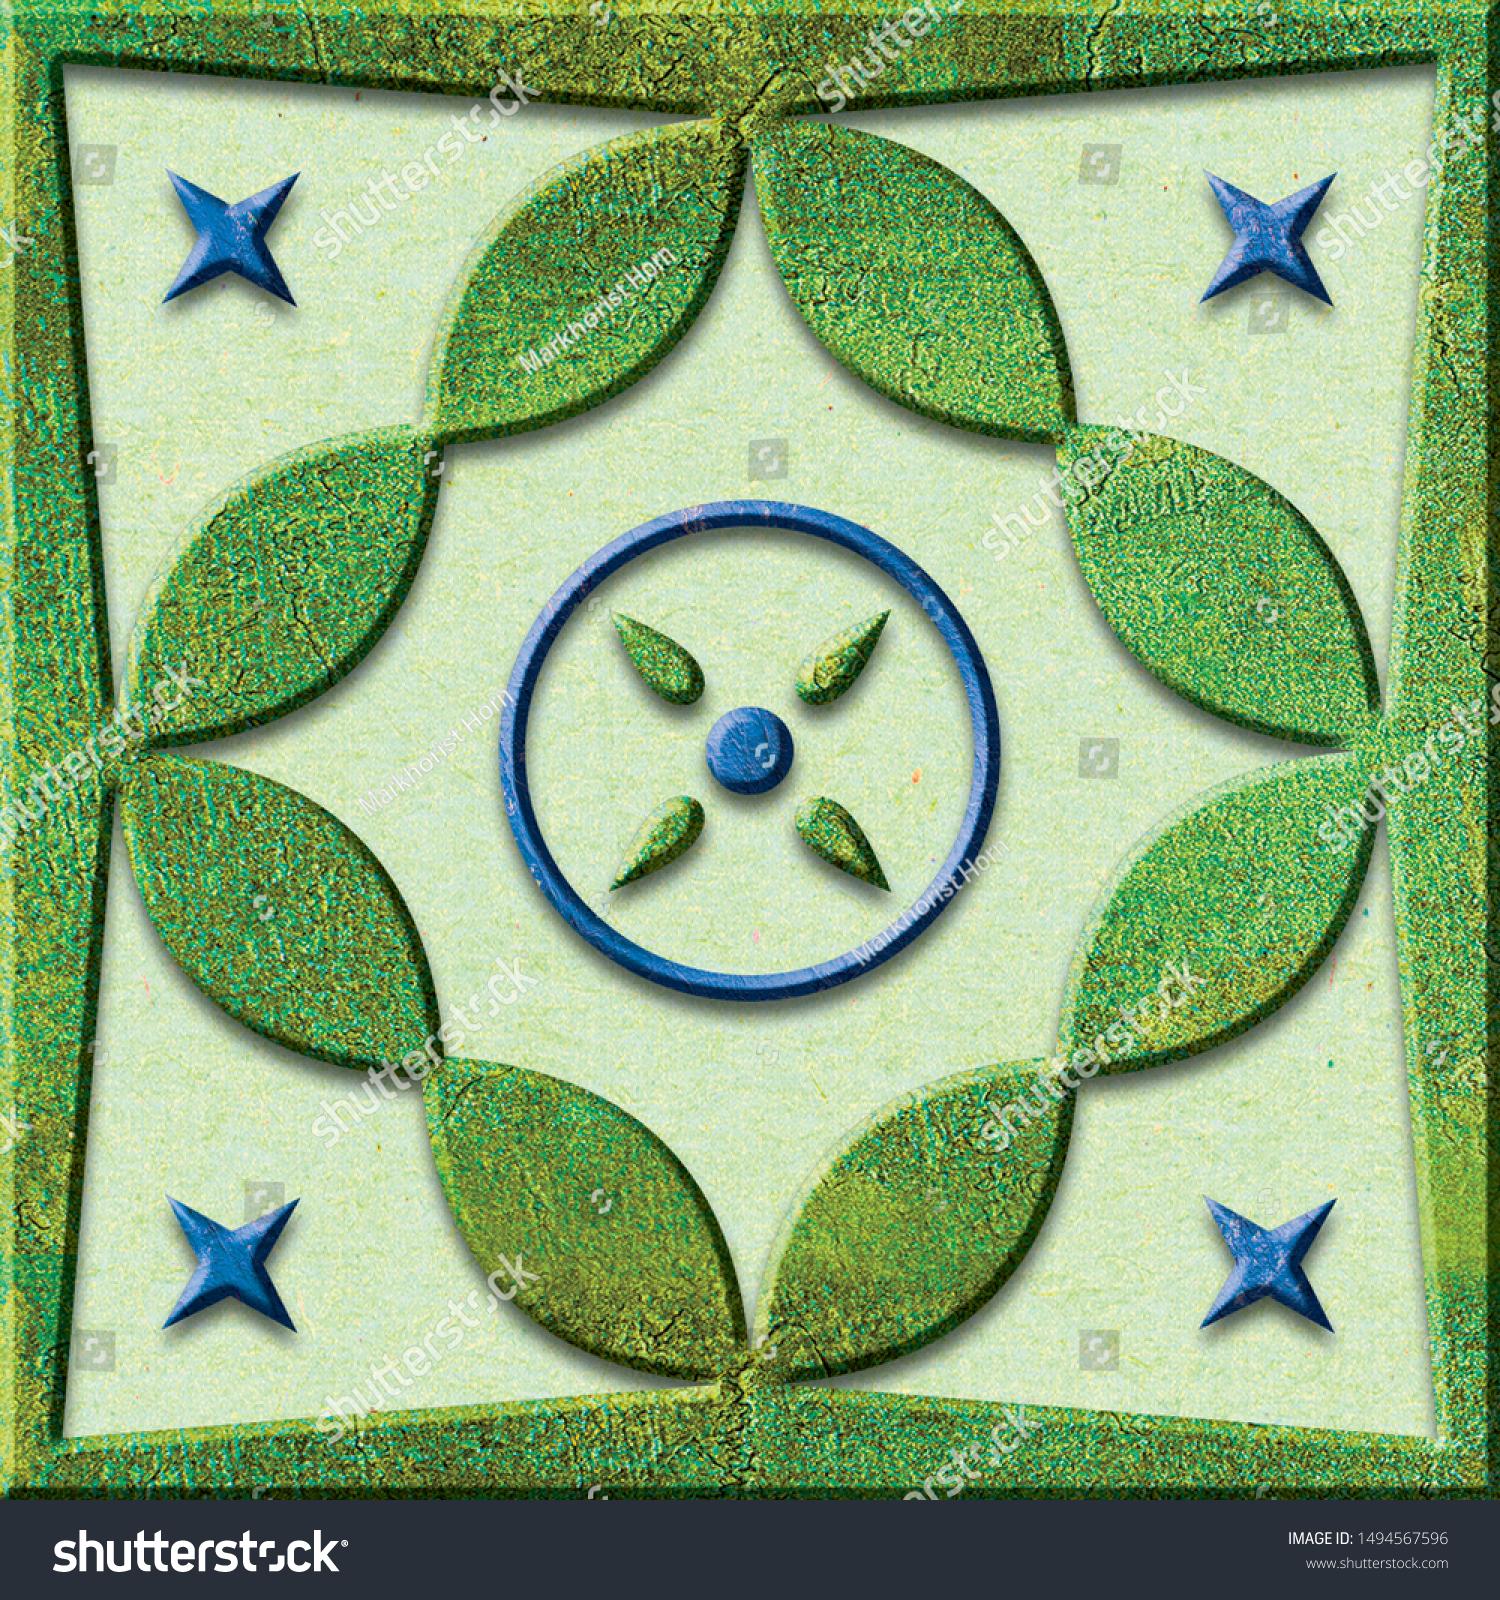 Washroom Wall Tiles Wallpapers Sage Color Stock Illustration 1494567596